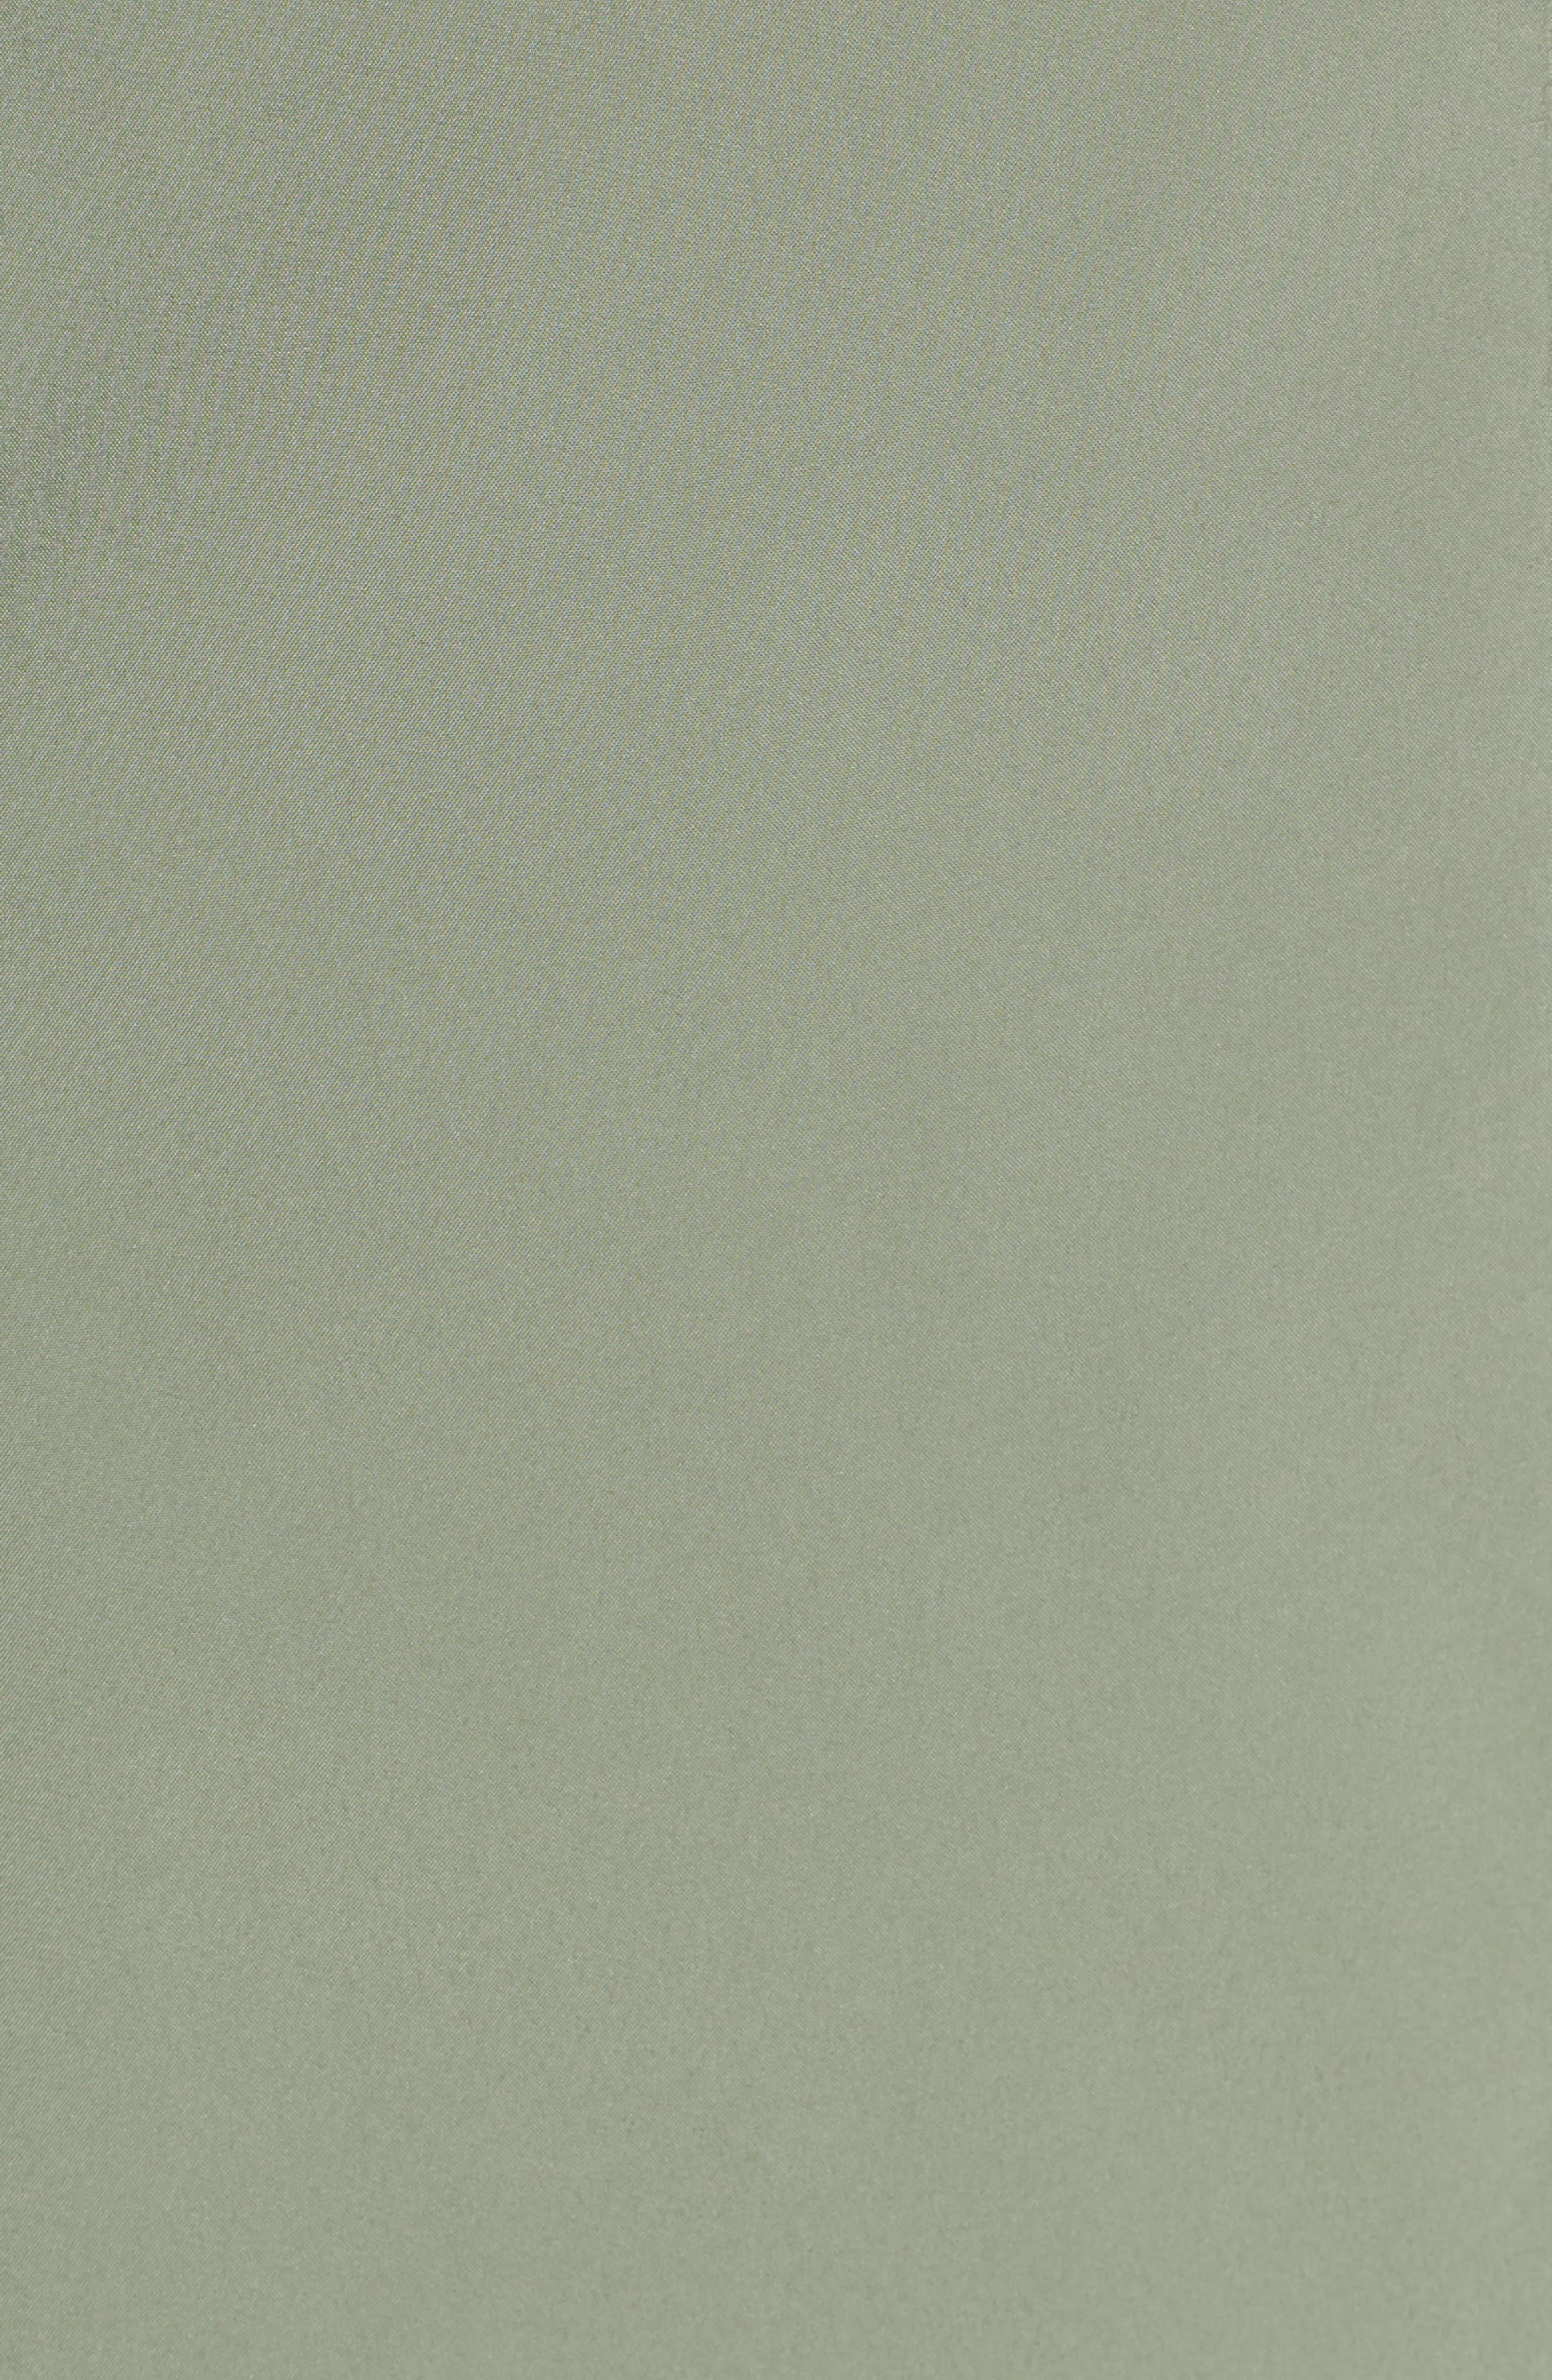 Pearl Cloth Hooded Jacket,                             Alternate thumbnail 13, color,